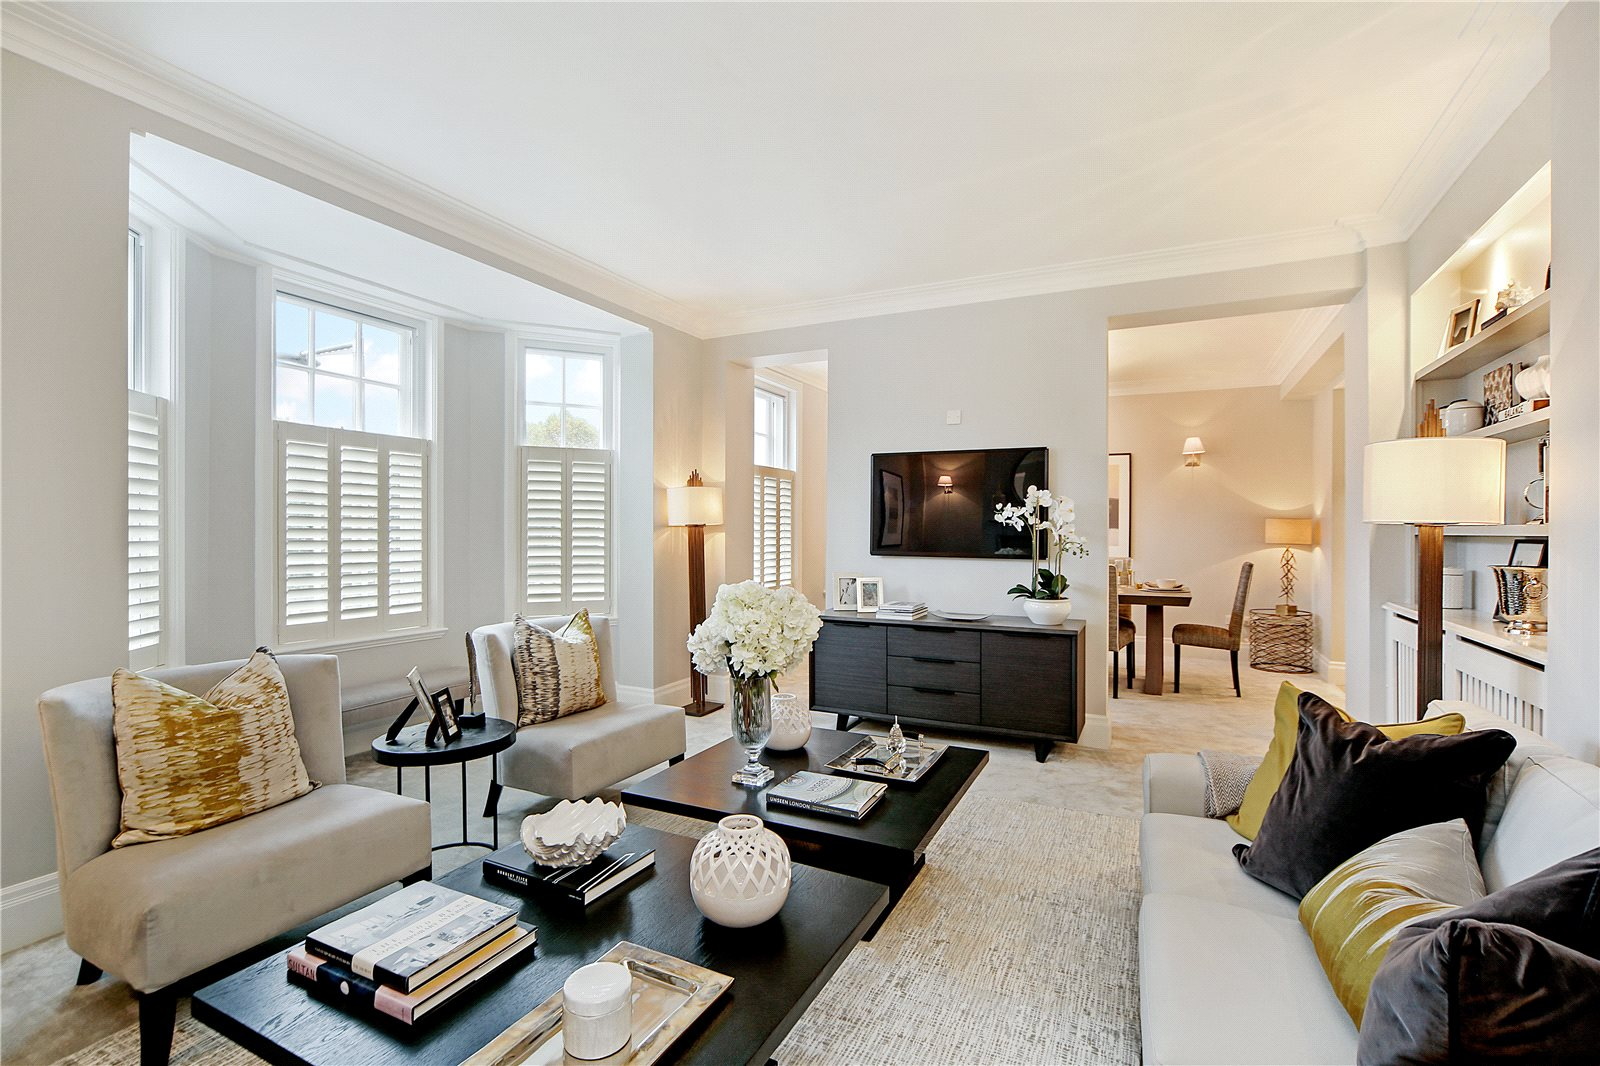 Апартаменты / Квартиры для того Продажа на Malvern Court, Onslow Square, South Kensington, London, SW7 South Kensington, London, Англия